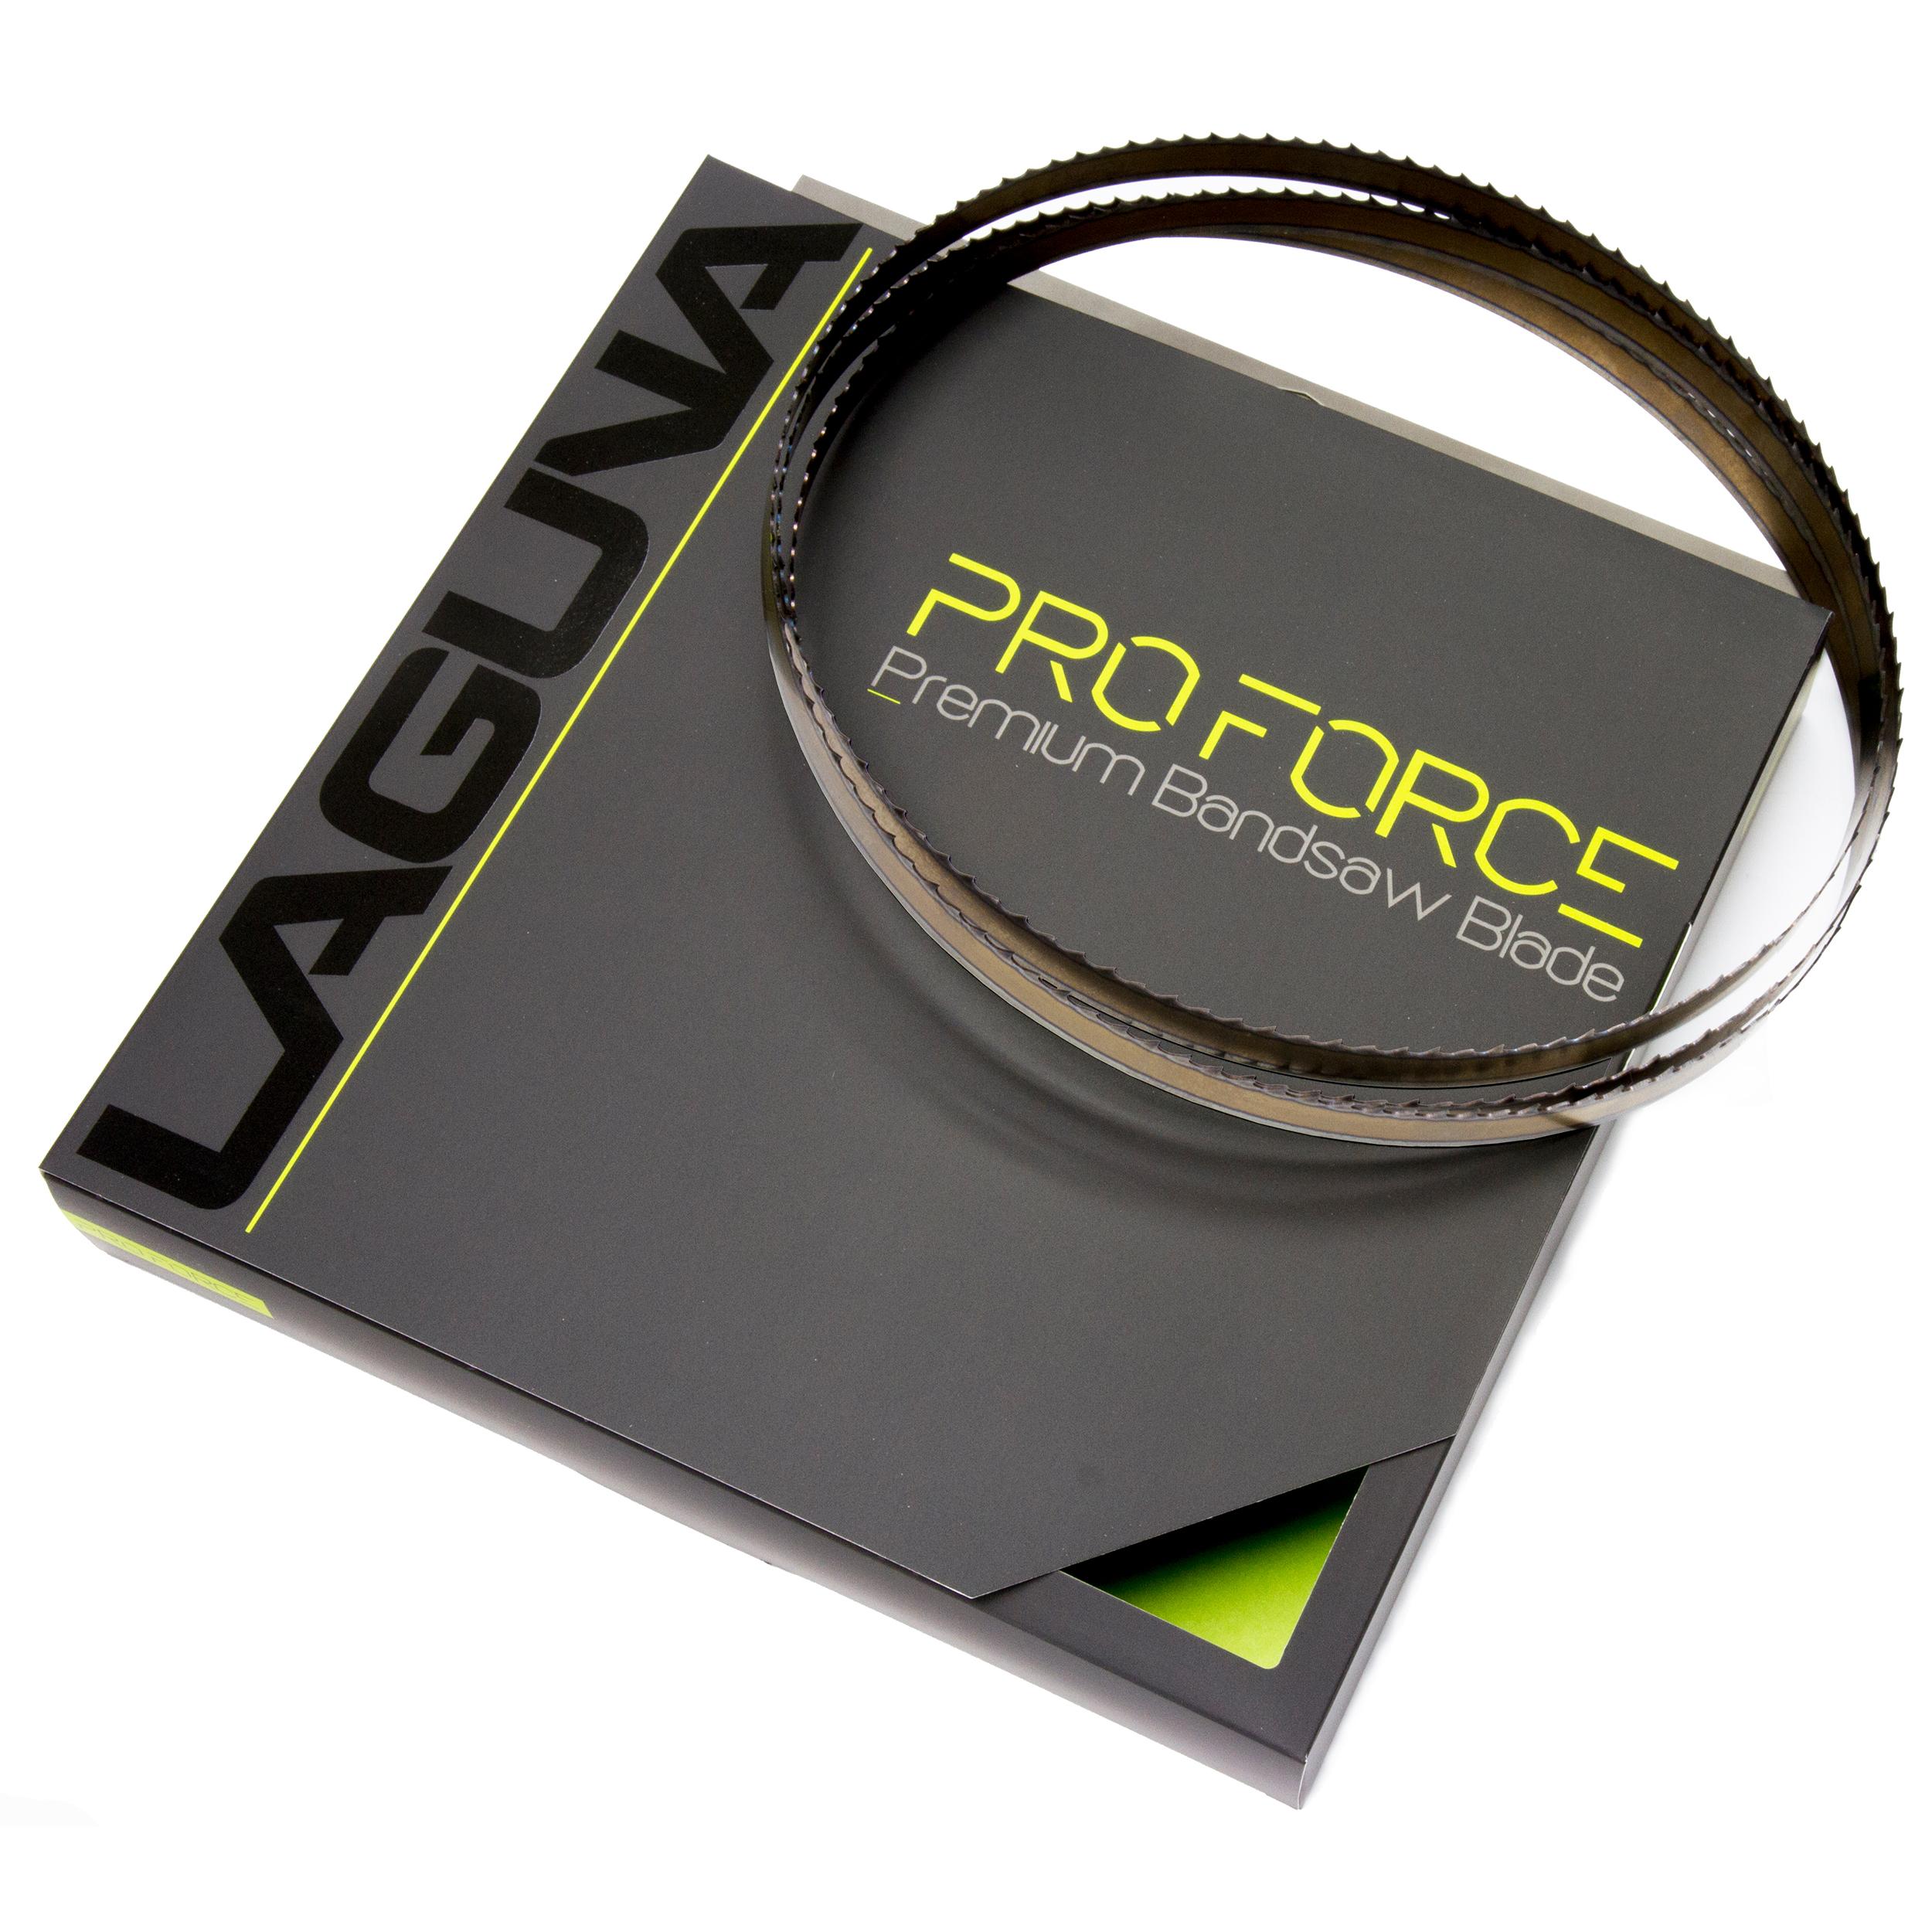 Pro Force 3 / 4